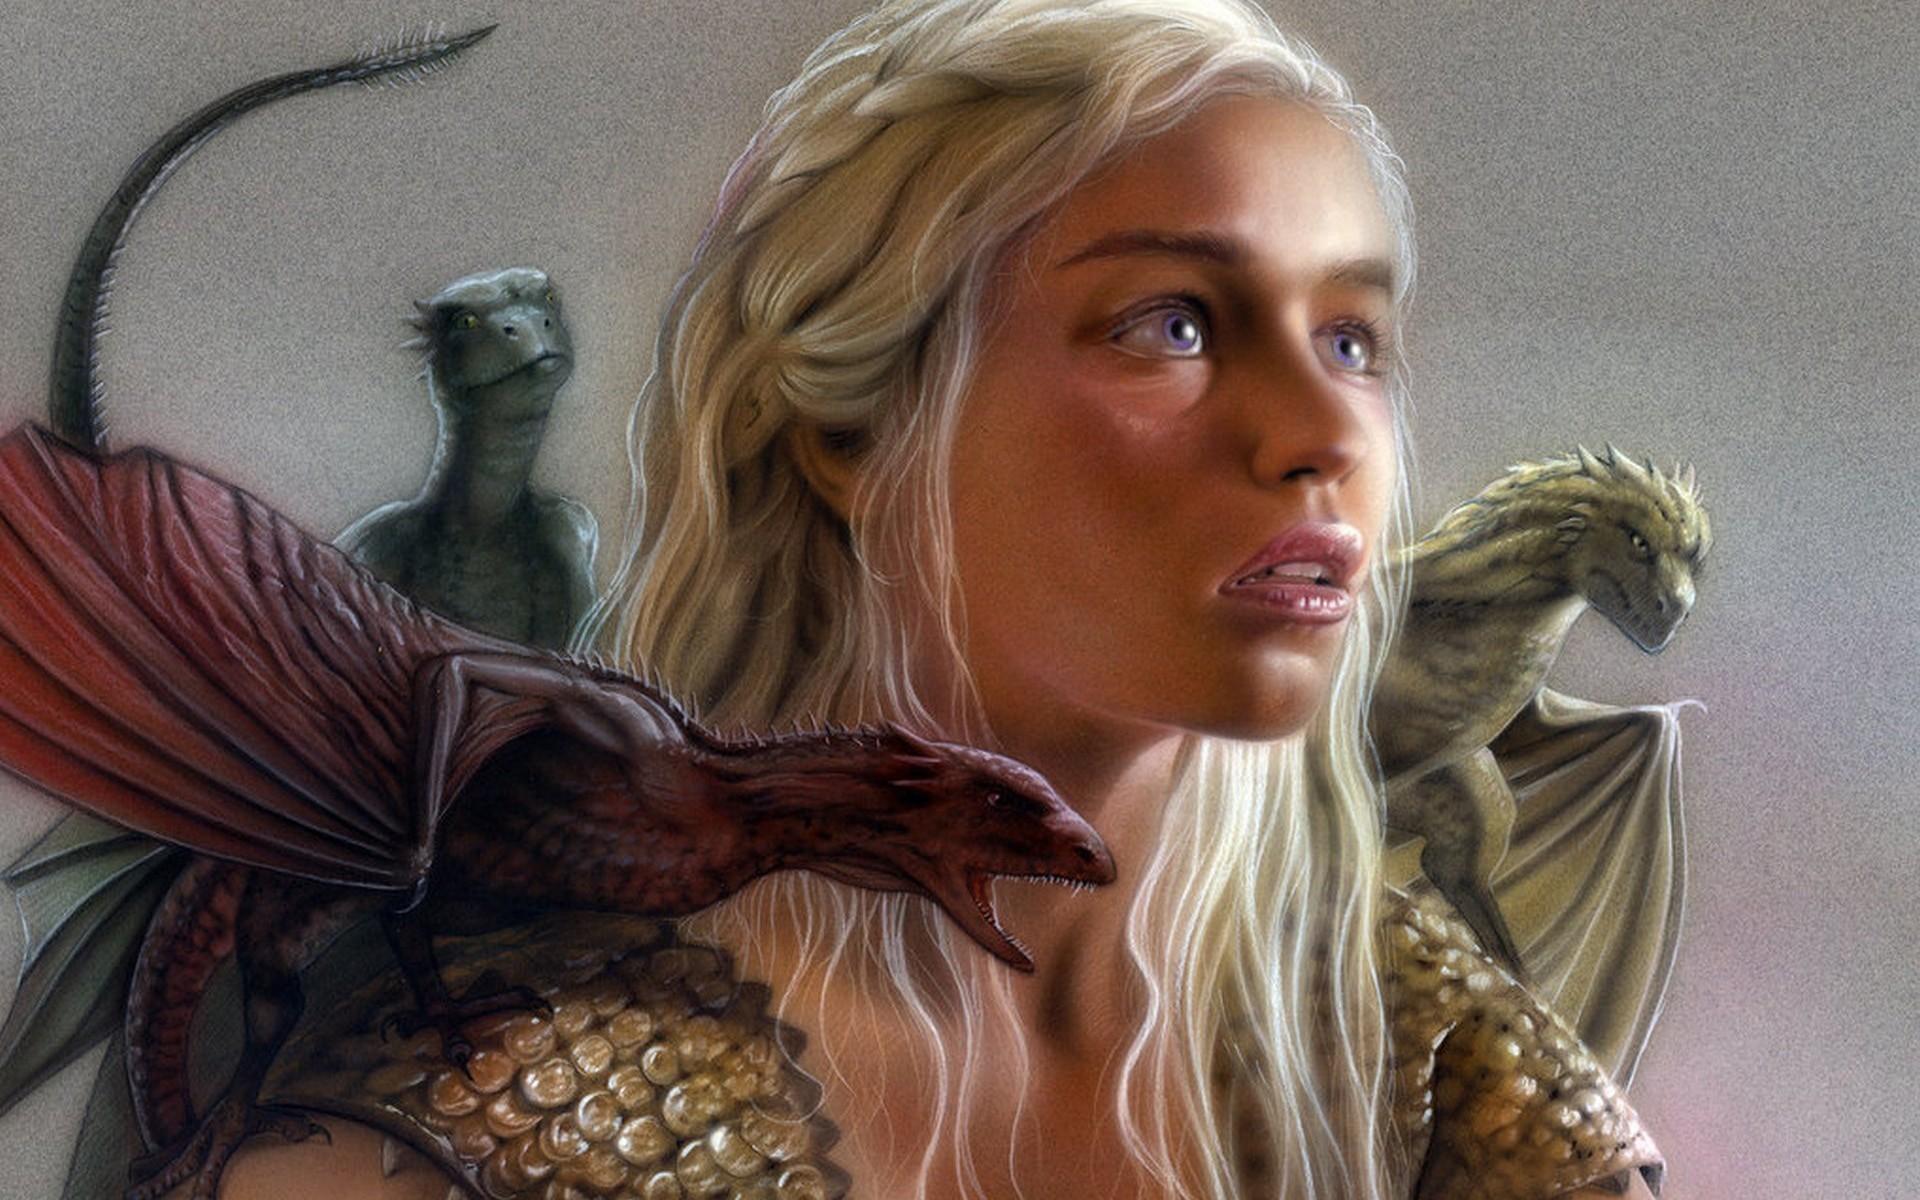 Game of Thrones Game of thrones Daenerys Targaryen Emilia Clarke HBO Series  series dragon dragons fantasy wallpaper background